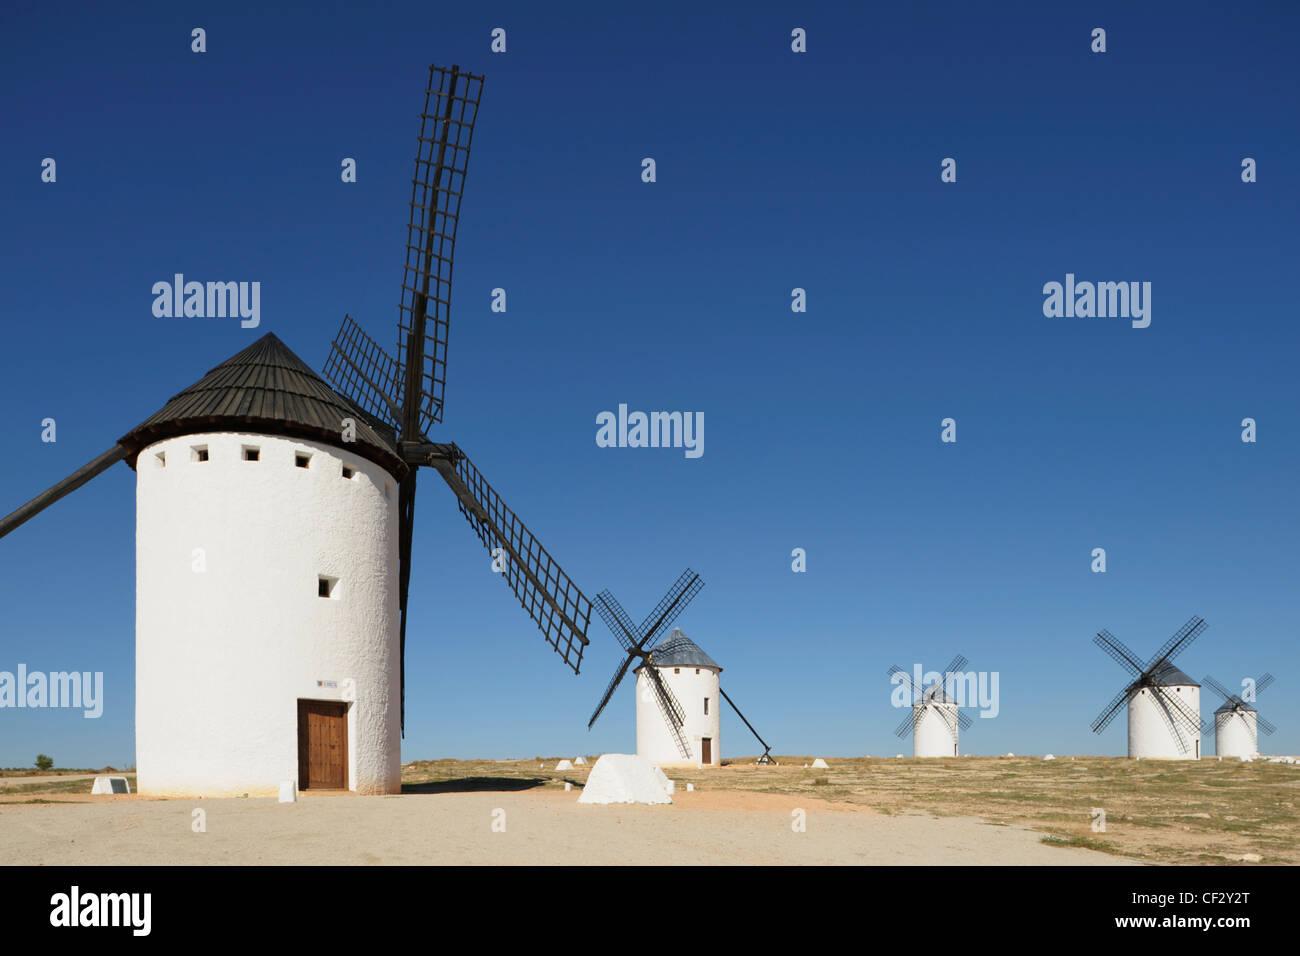 Windmills Of La Mancha; Campo De Criptana Ciudad Real Castilla La Mancha Spain - Stock Image